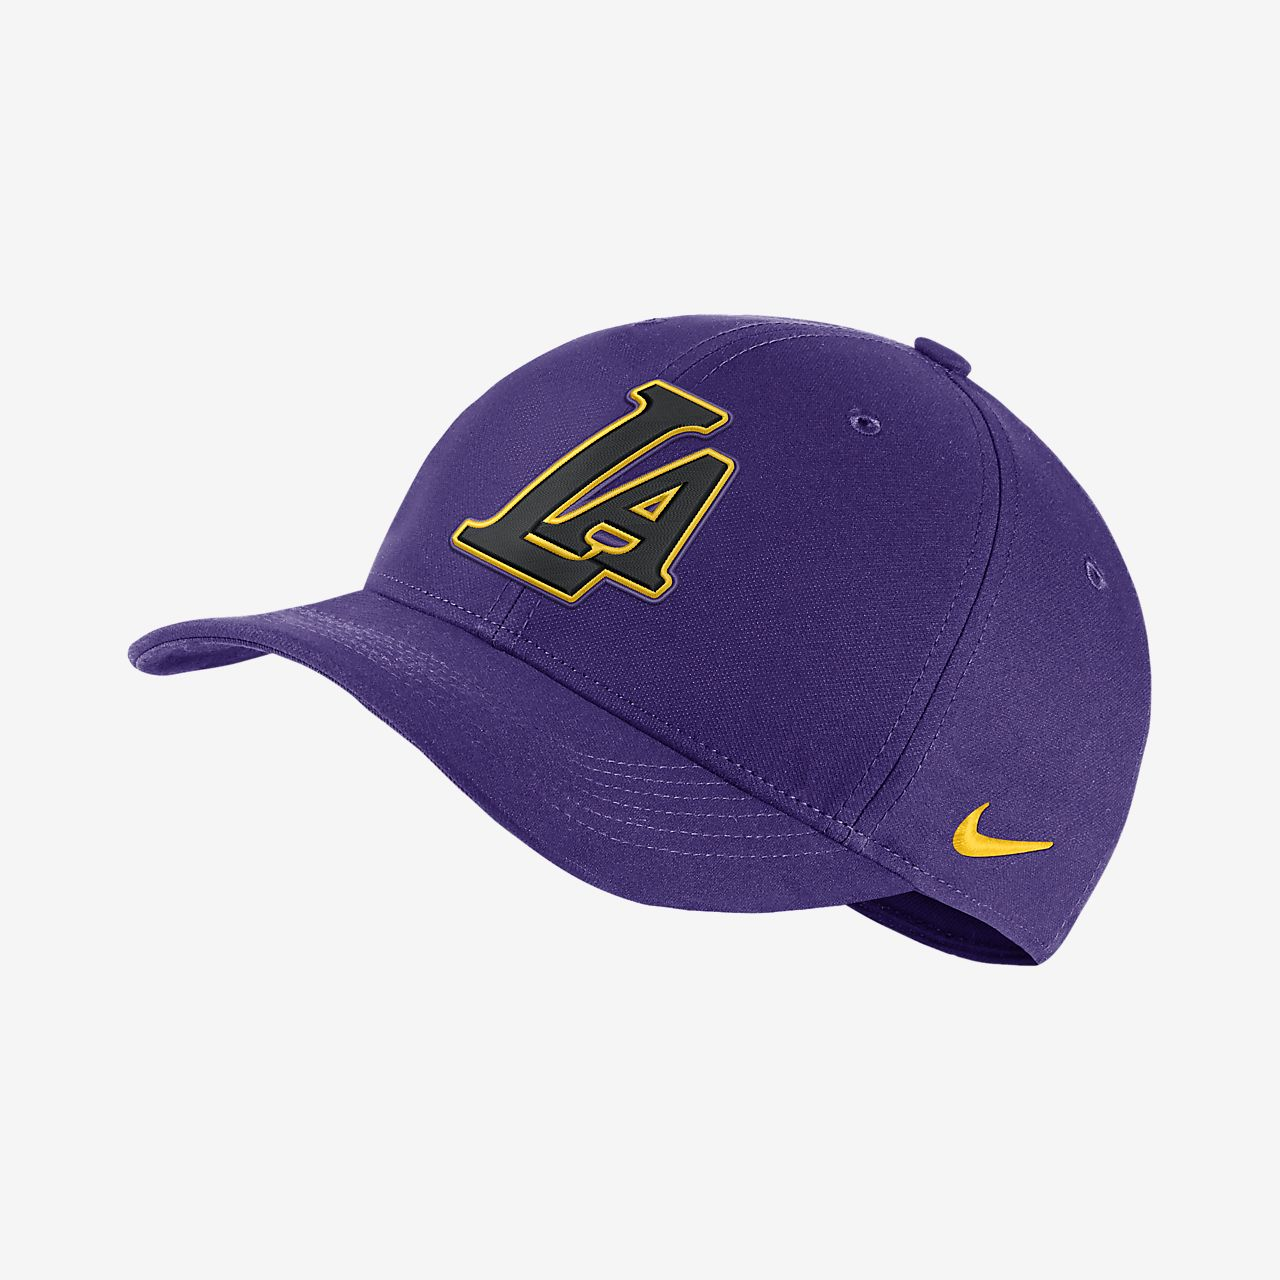 Los Angeles Lakers City Edition Nike AeroBill Classic99 NBA 帽款